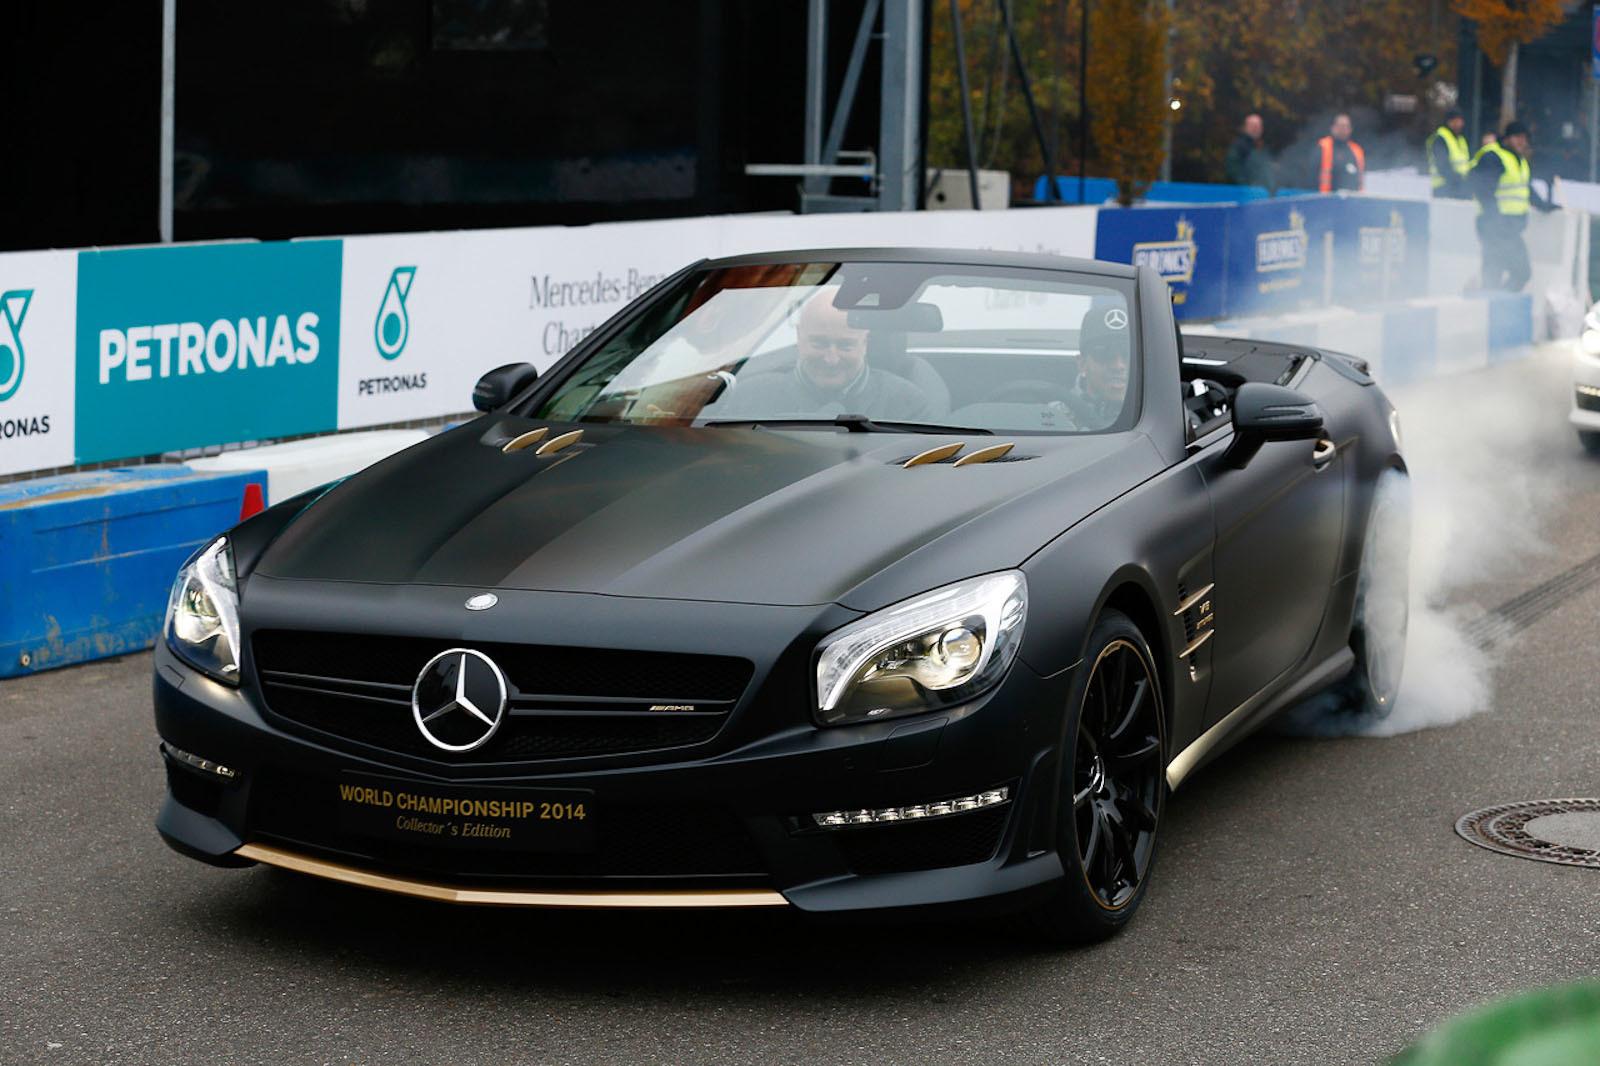 Mercedes SL63 AMG Championship 2014